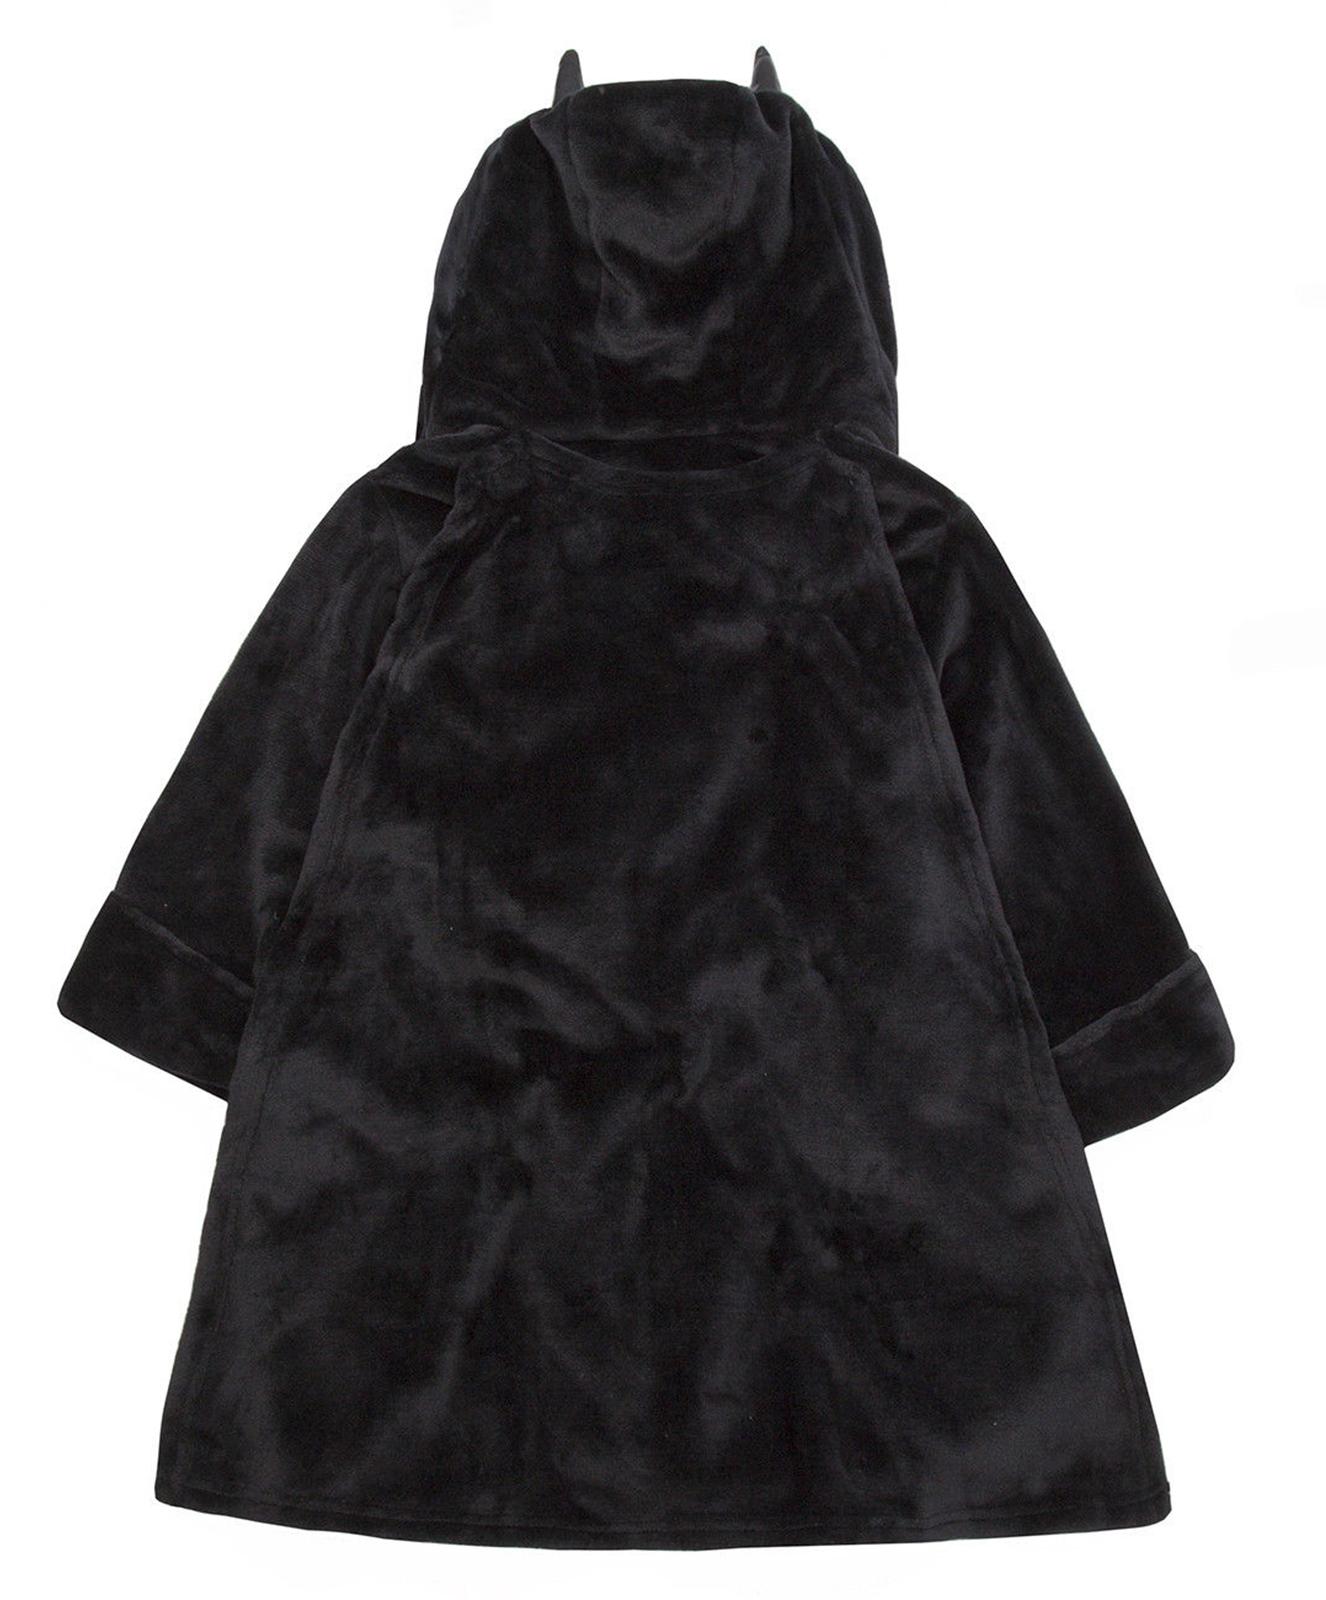 Boys Batman Dressing Gown Bat Hooded Bath Robe Black Ages 3 4 5 6 7 8 9 10 Years